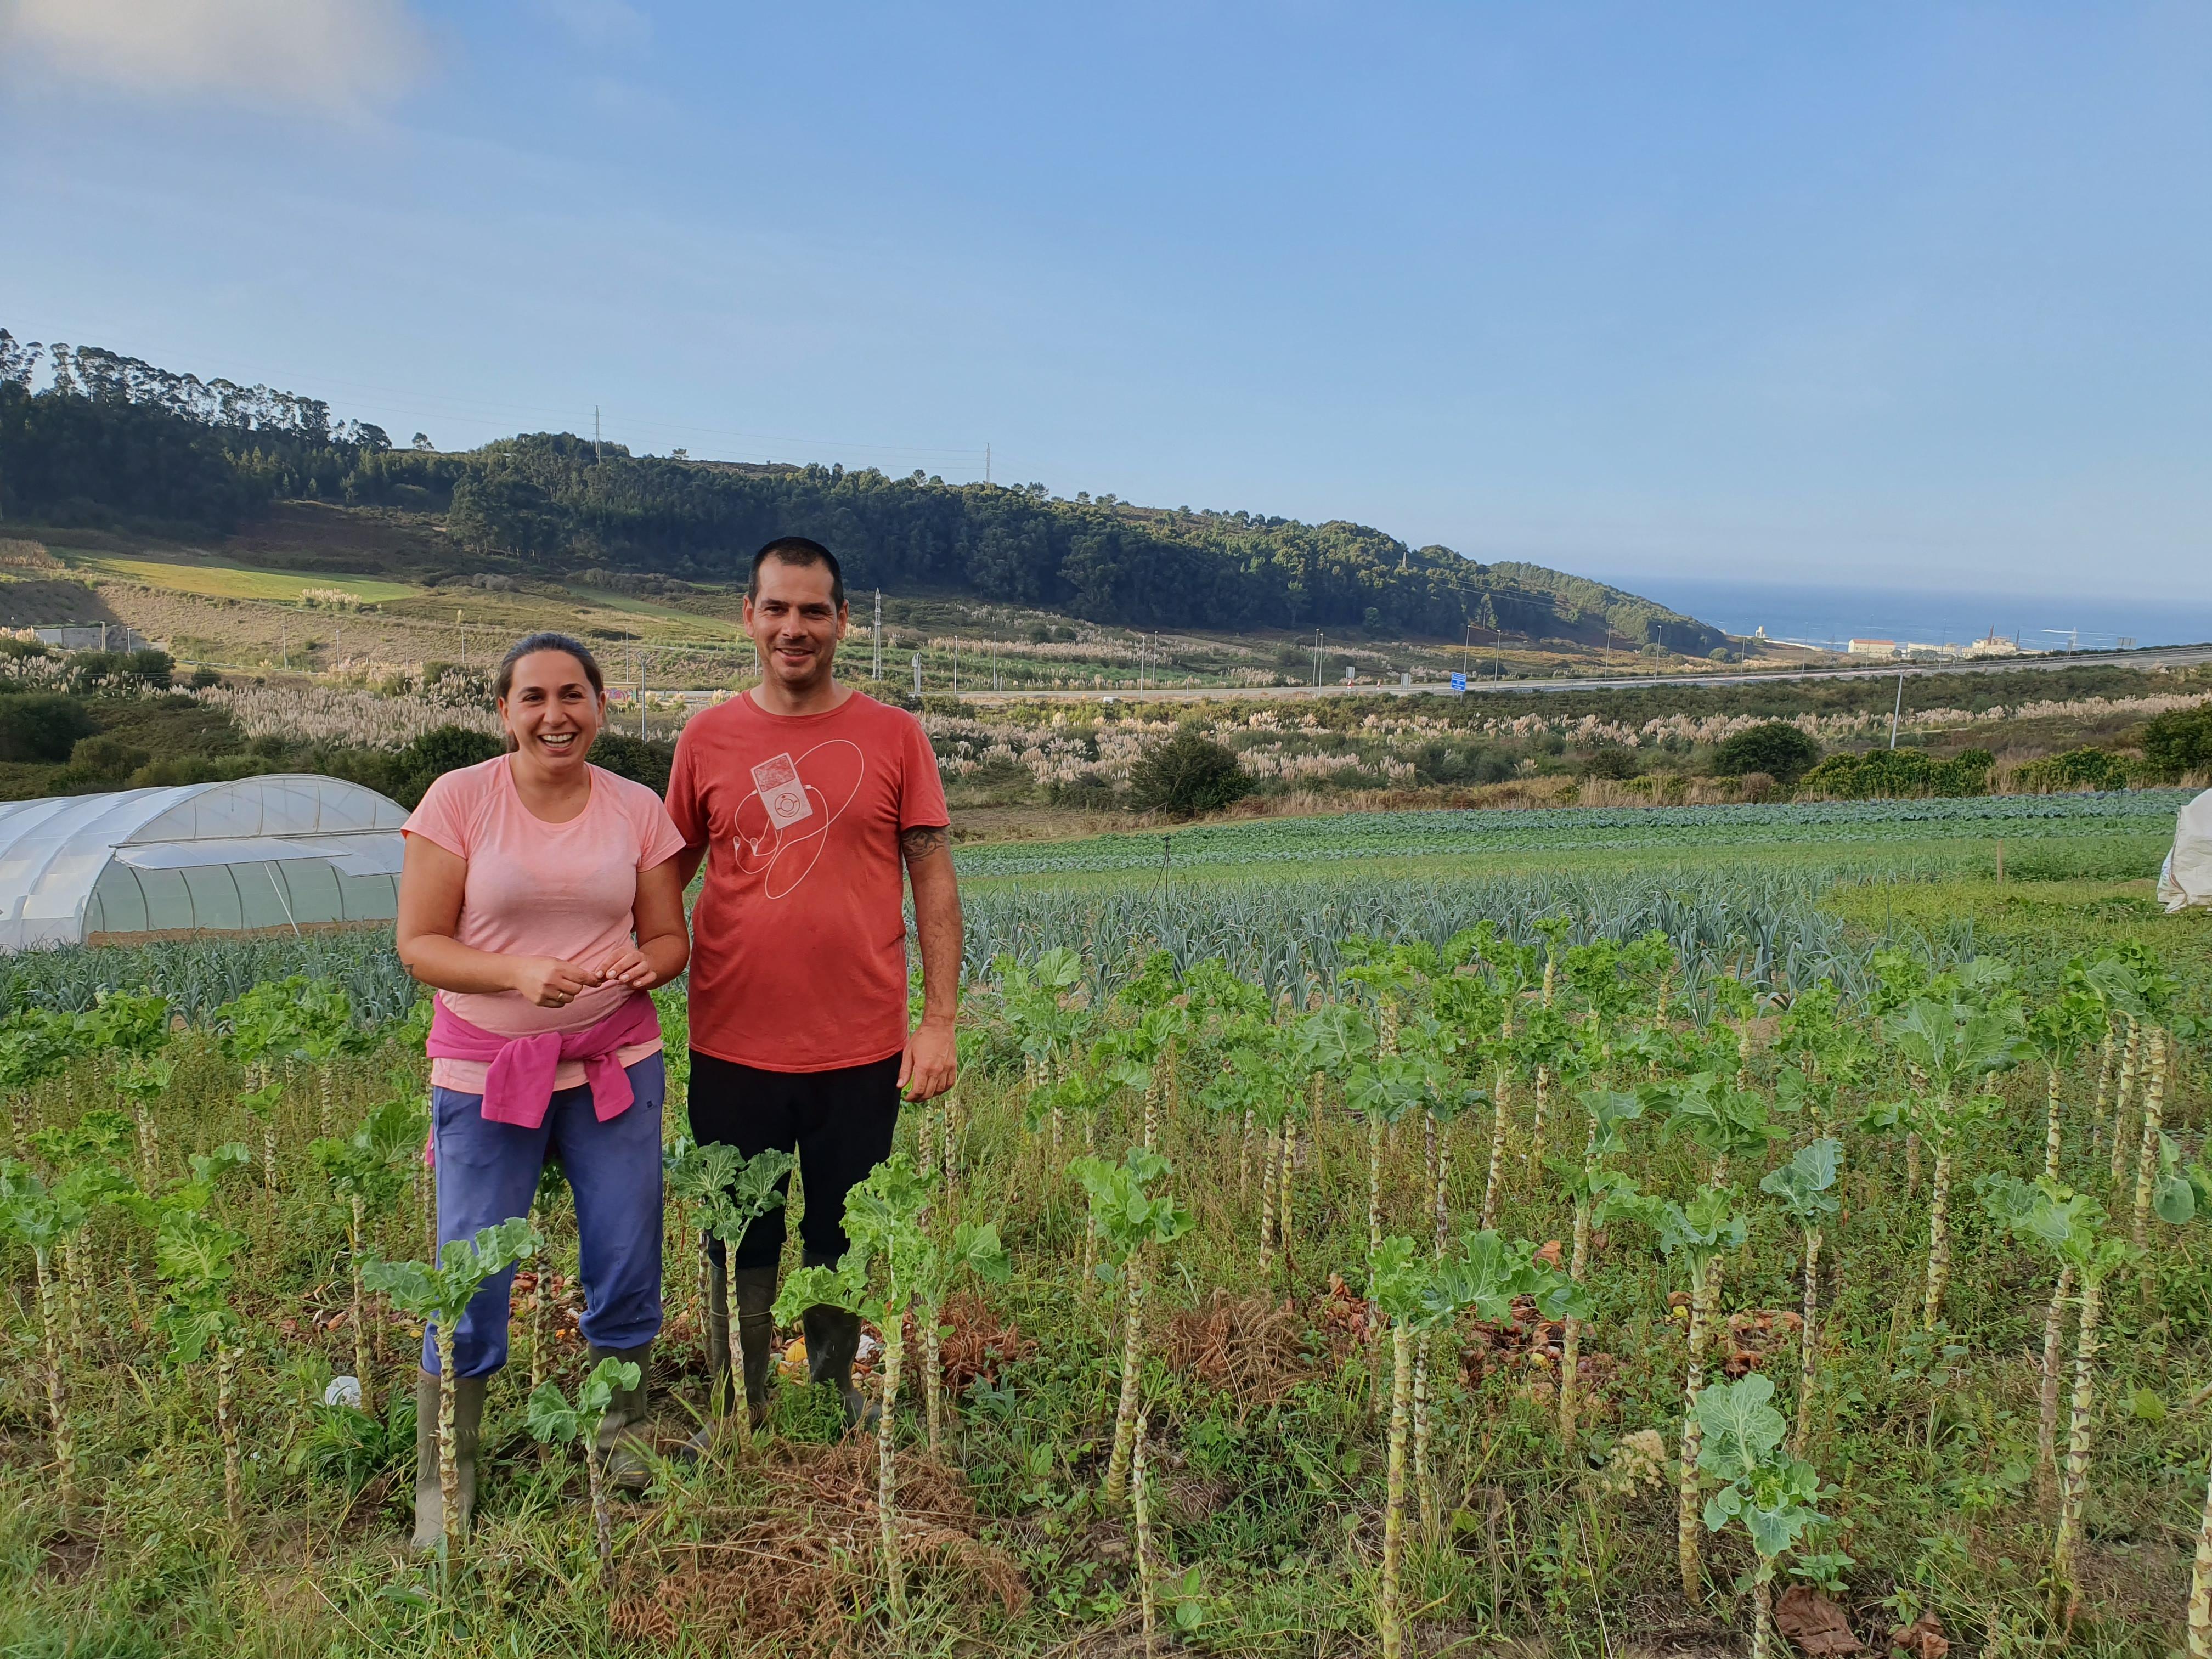 Leticia i Gustavo, Horta Millarada - Arteixo